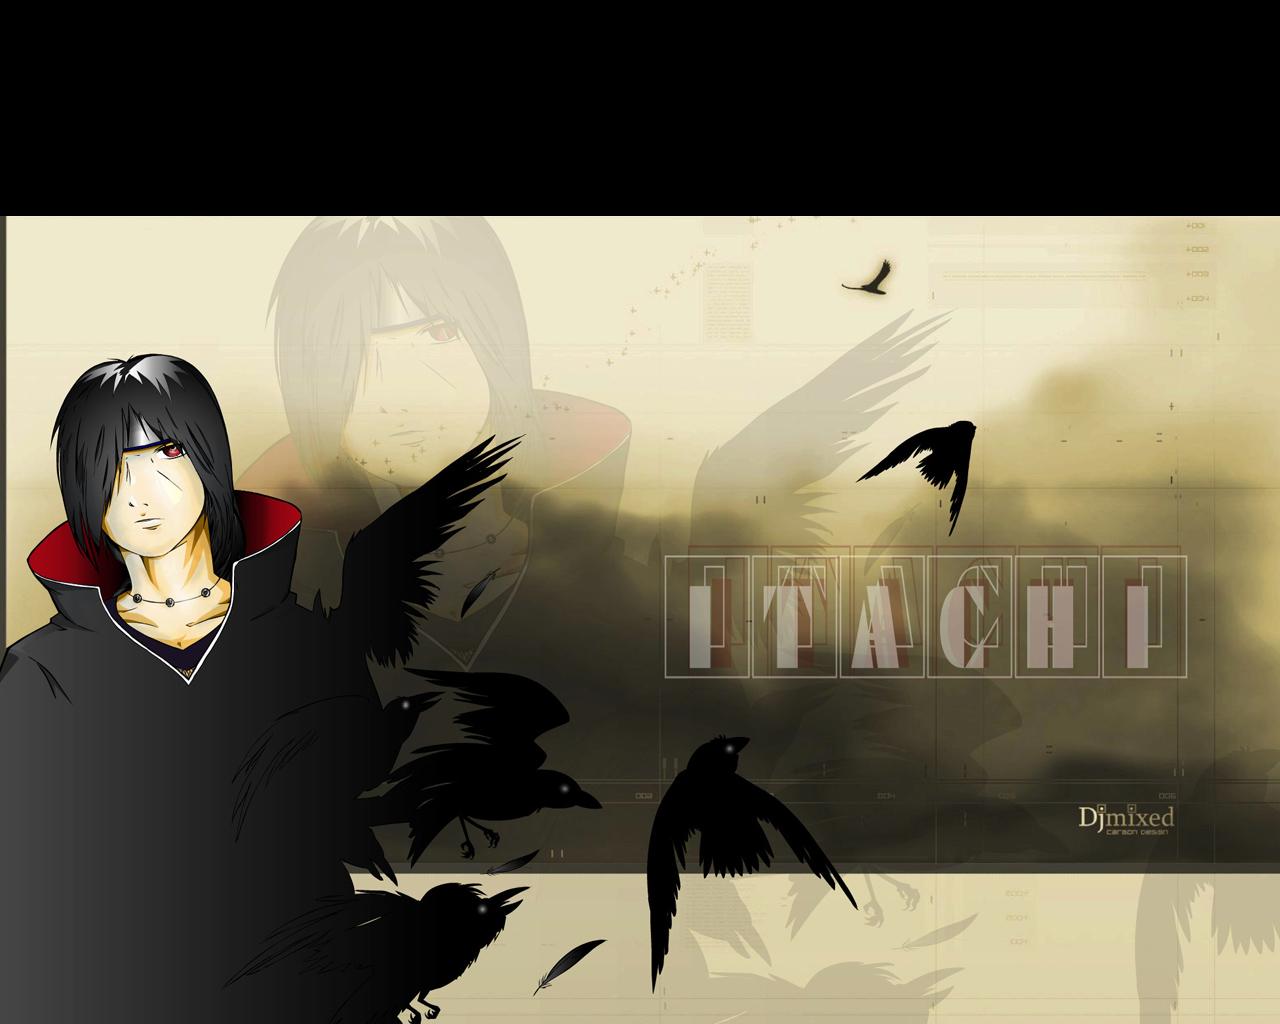 Itachi Sharingan Uchiha Hd 1280x1024px 1280x1024px Wallpapers itachi 1280x1024